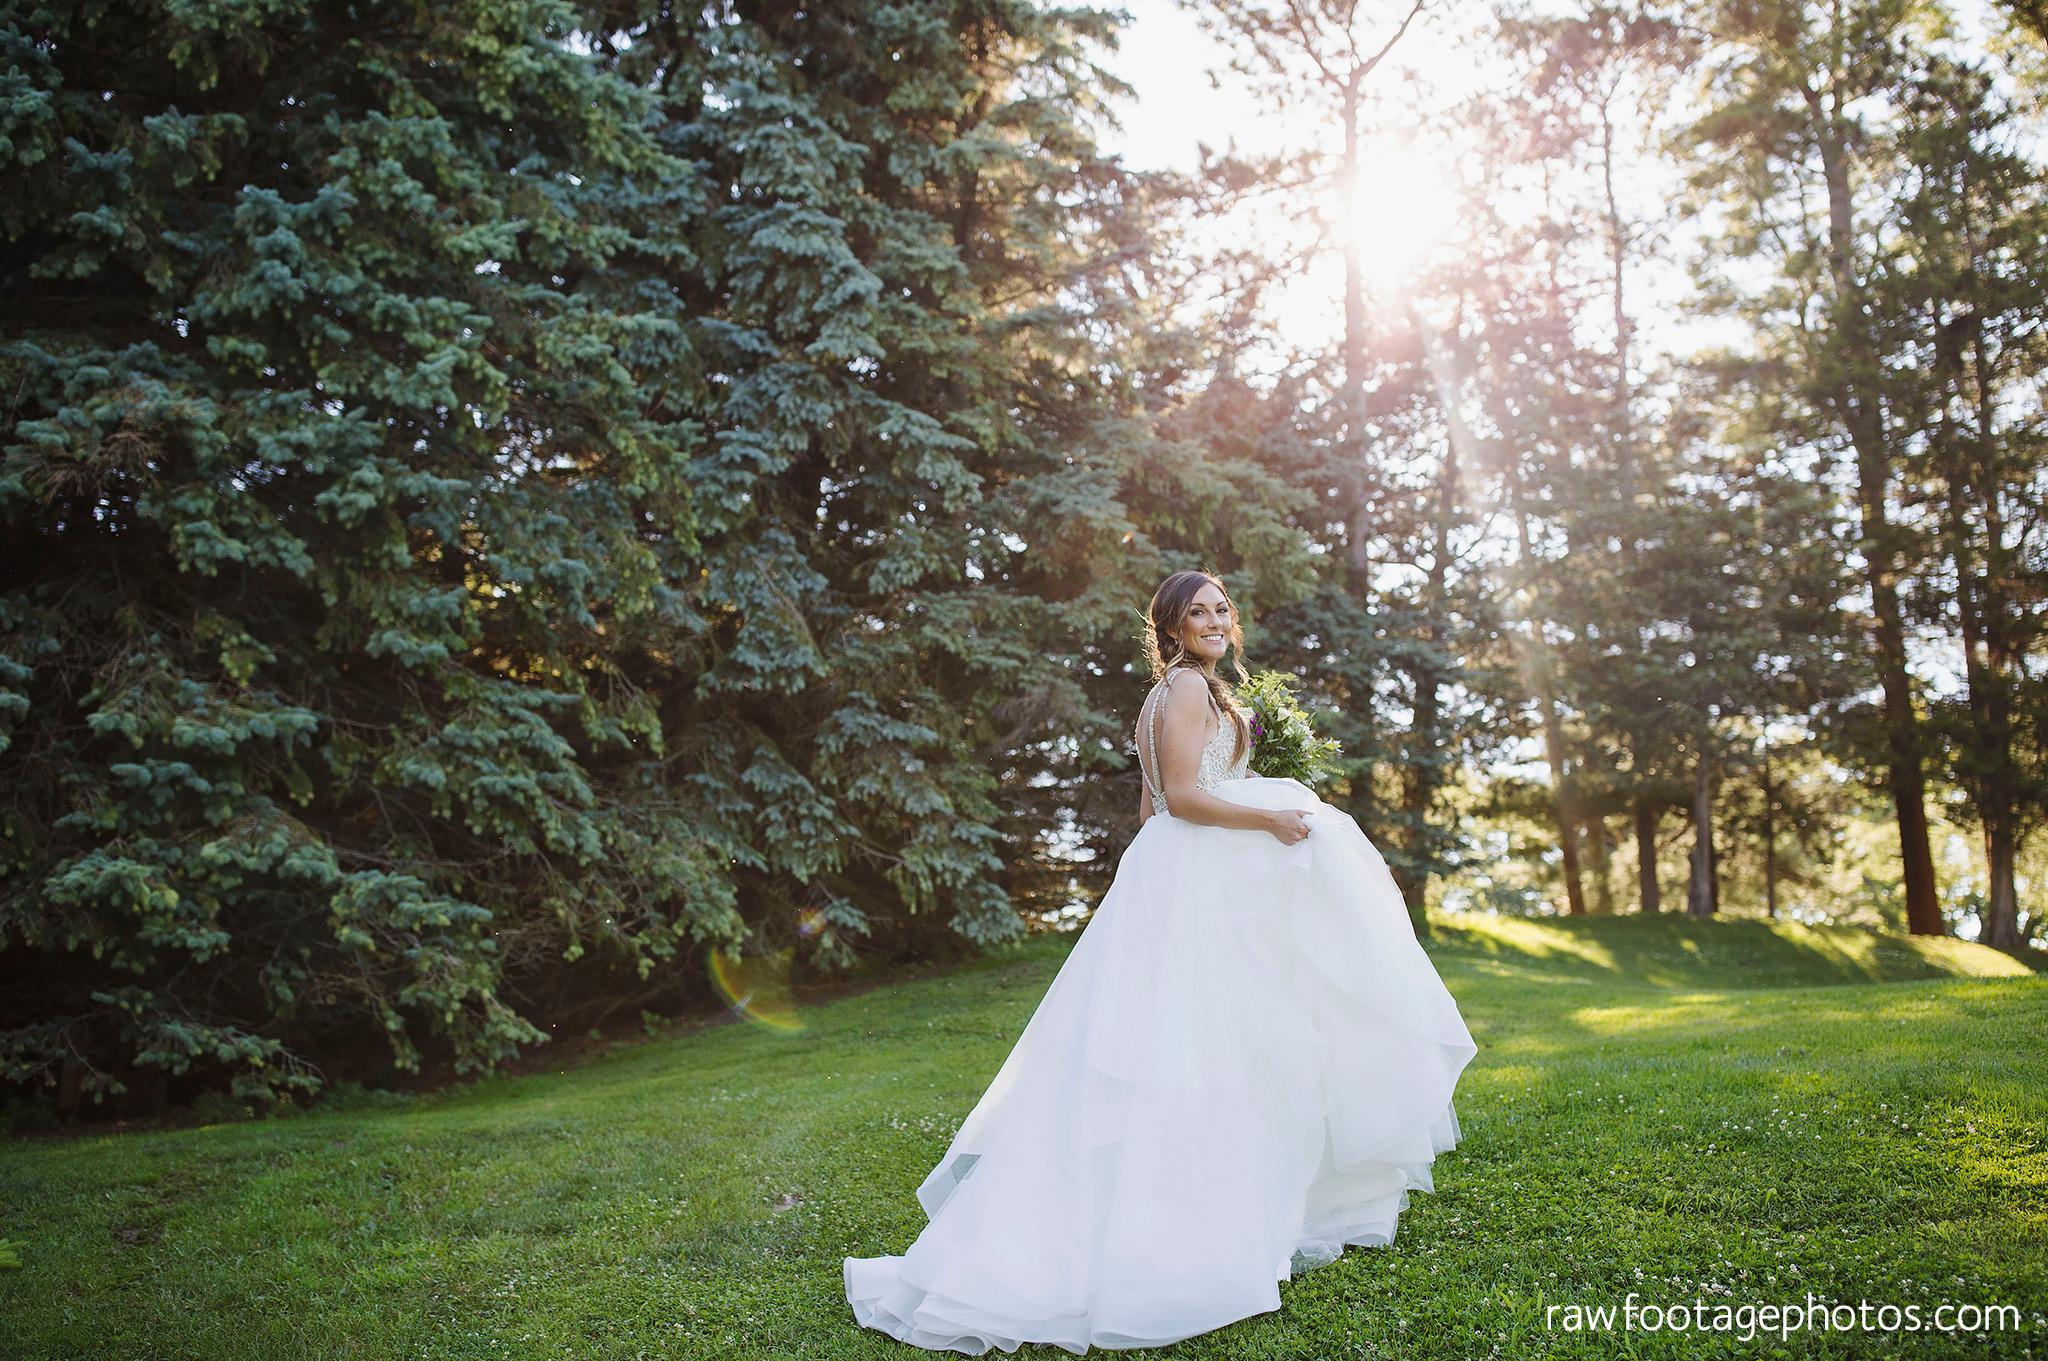 london_ontario_wedding_photographer-grand_bend_wedding_photographer-oakwood_resort_wedding-beach_wedding-sunset_wedding-raw_footage_photography057.jpg